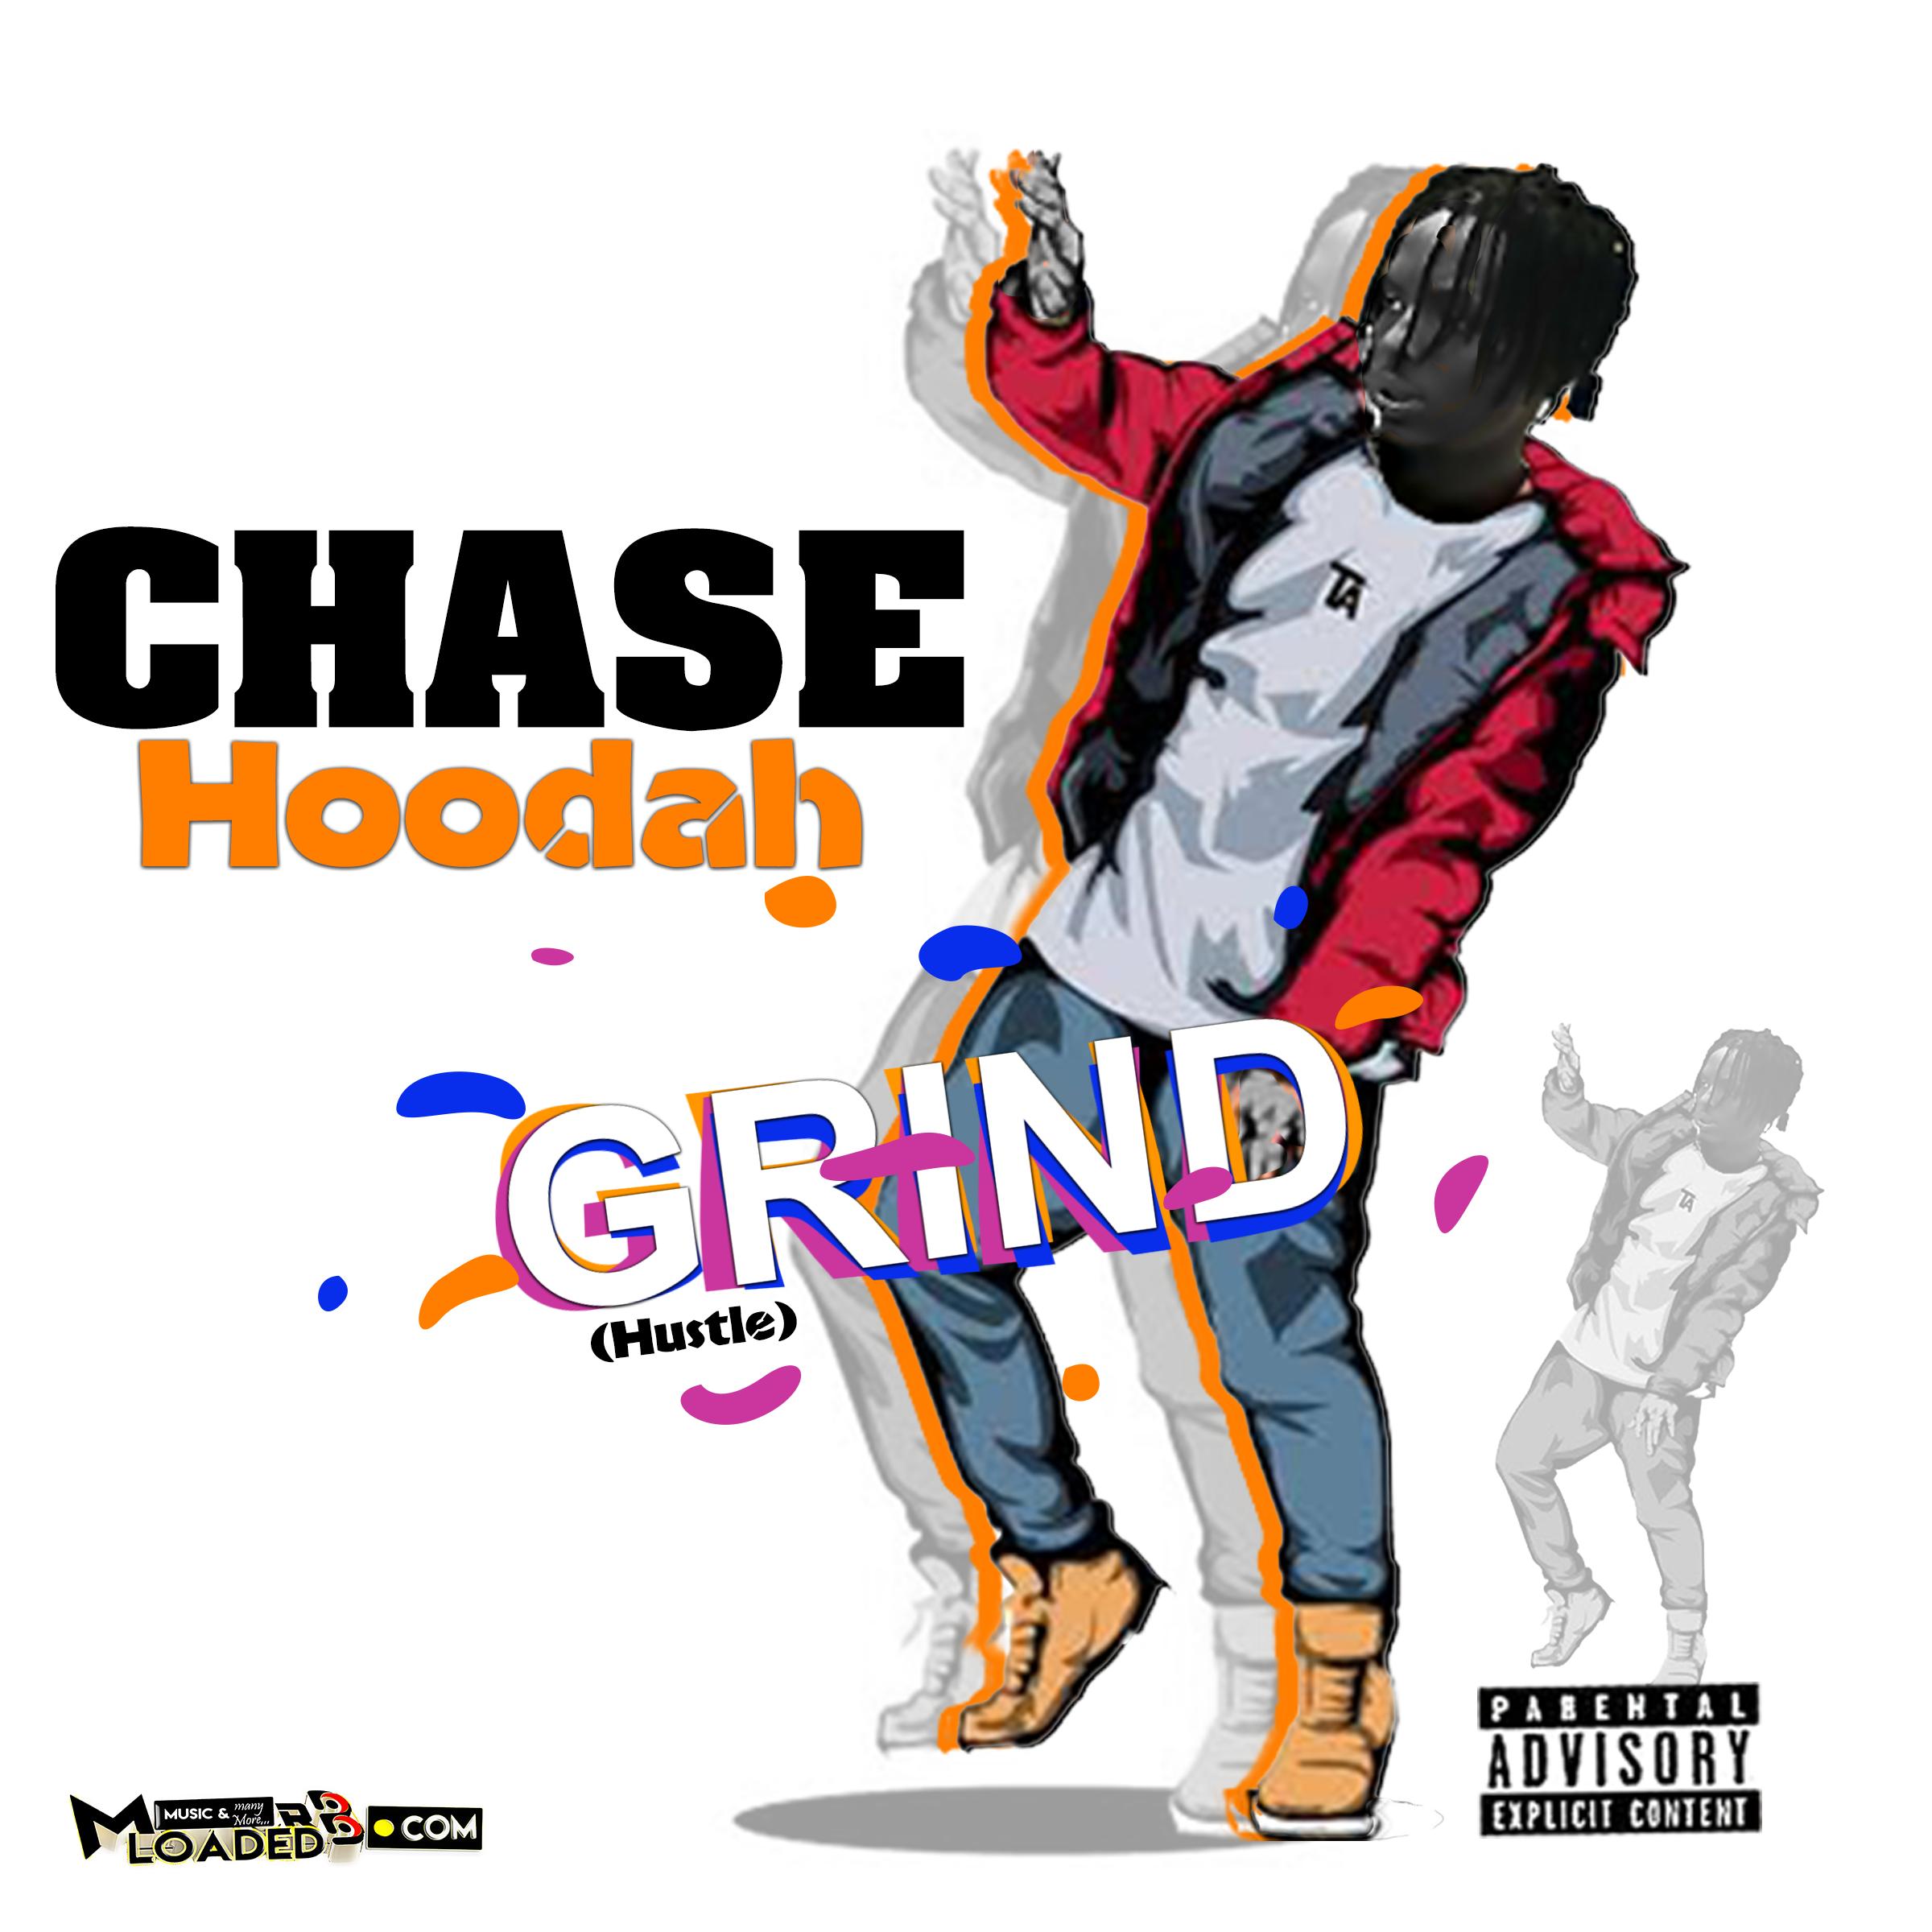 [Anticipate] Chase Hoodah – Grind